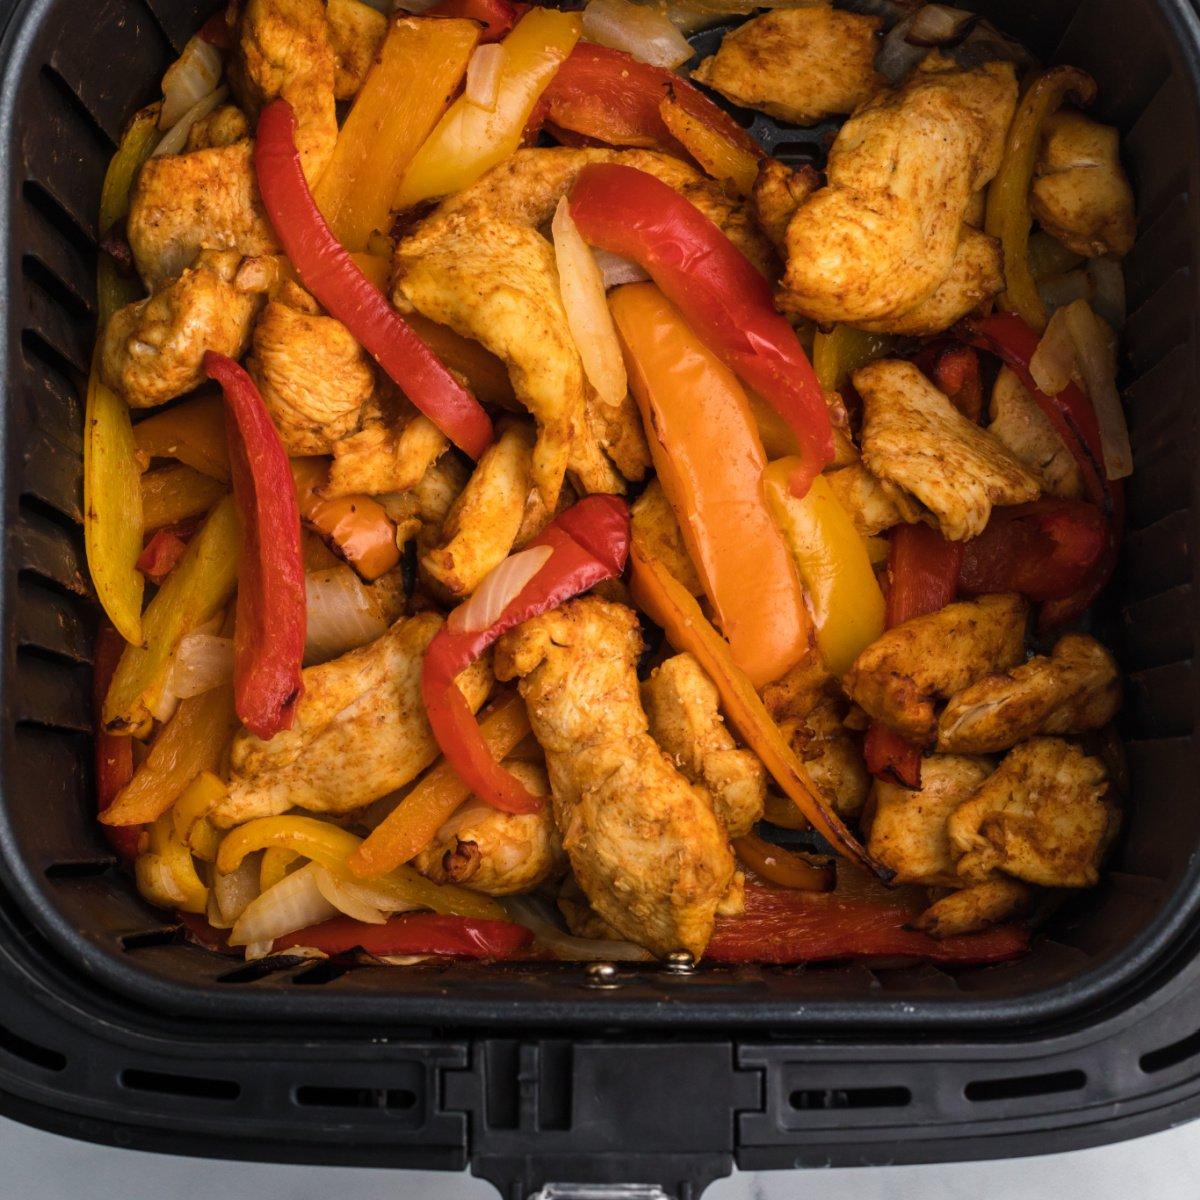 CHicken fajitas and vegetables in the air fryer basket.